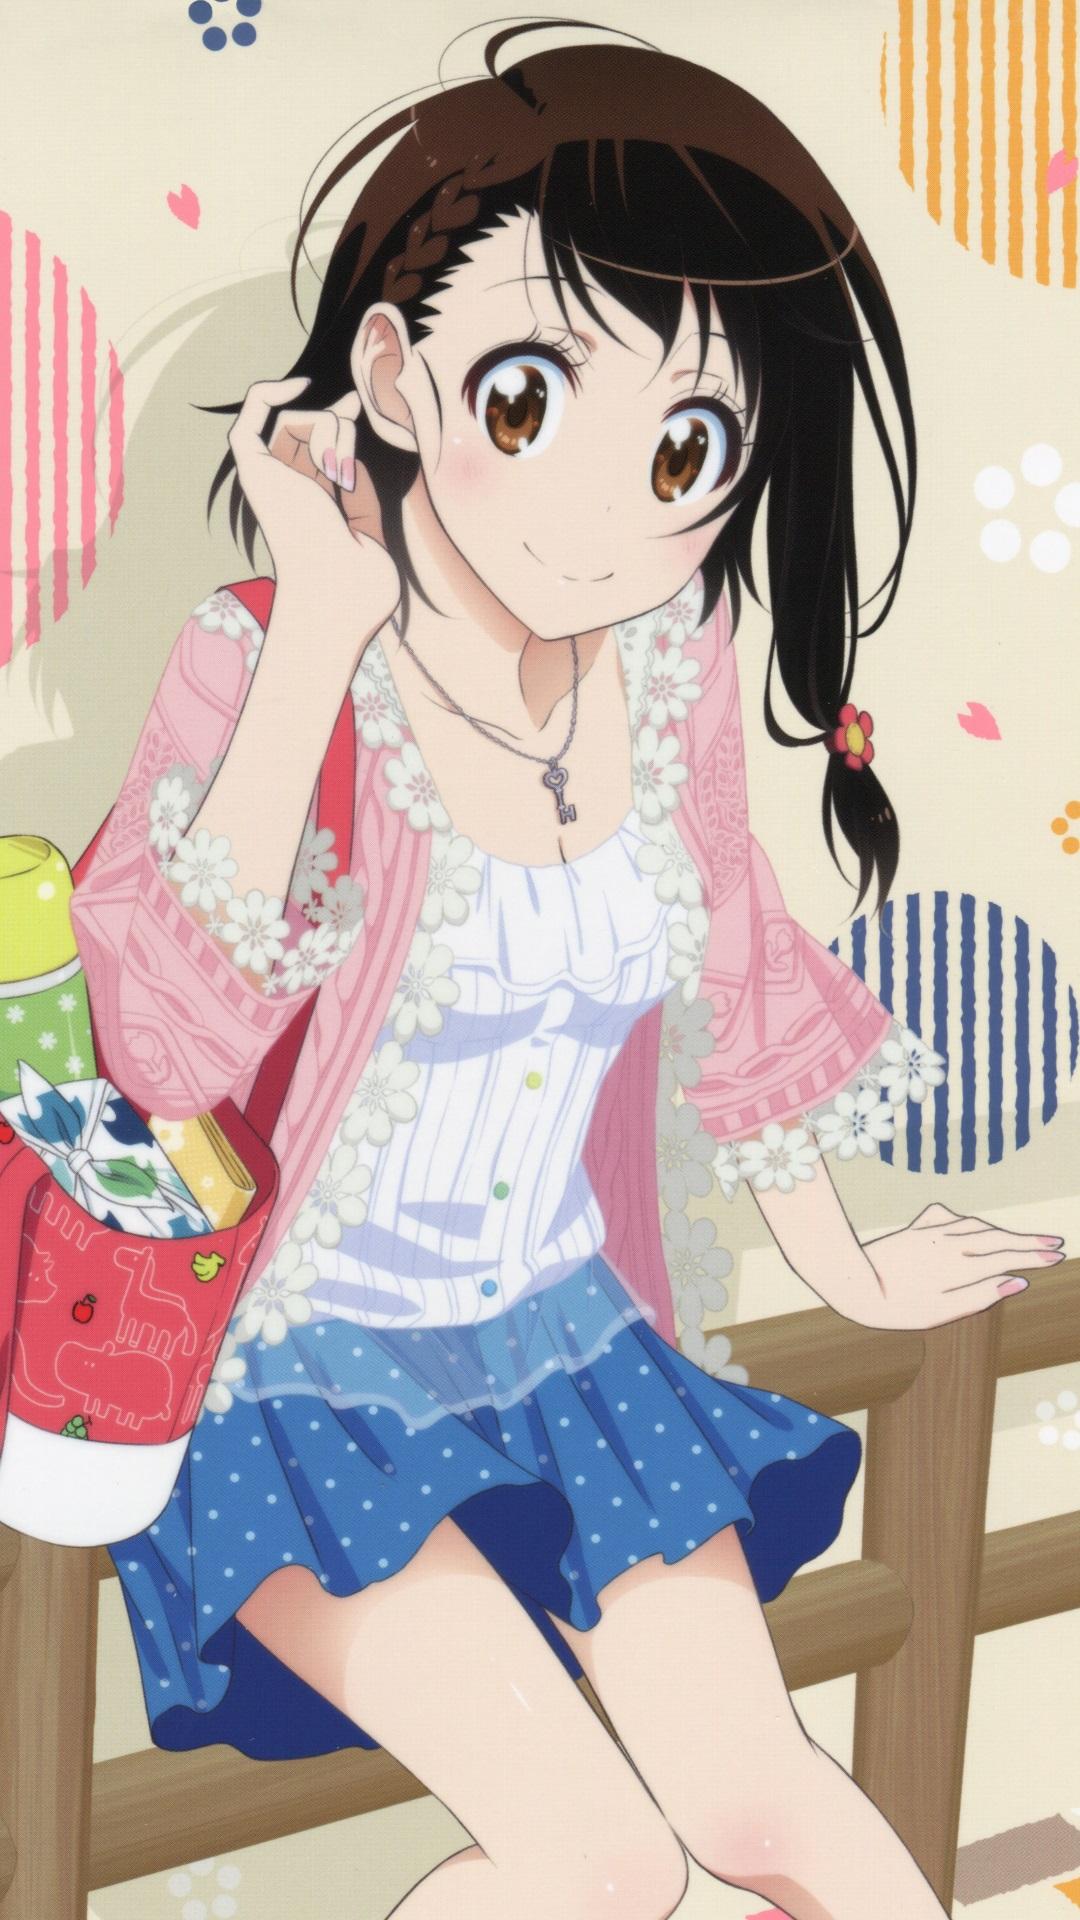 Nisekoi False Love mobile phone wallpapers 1080x1920